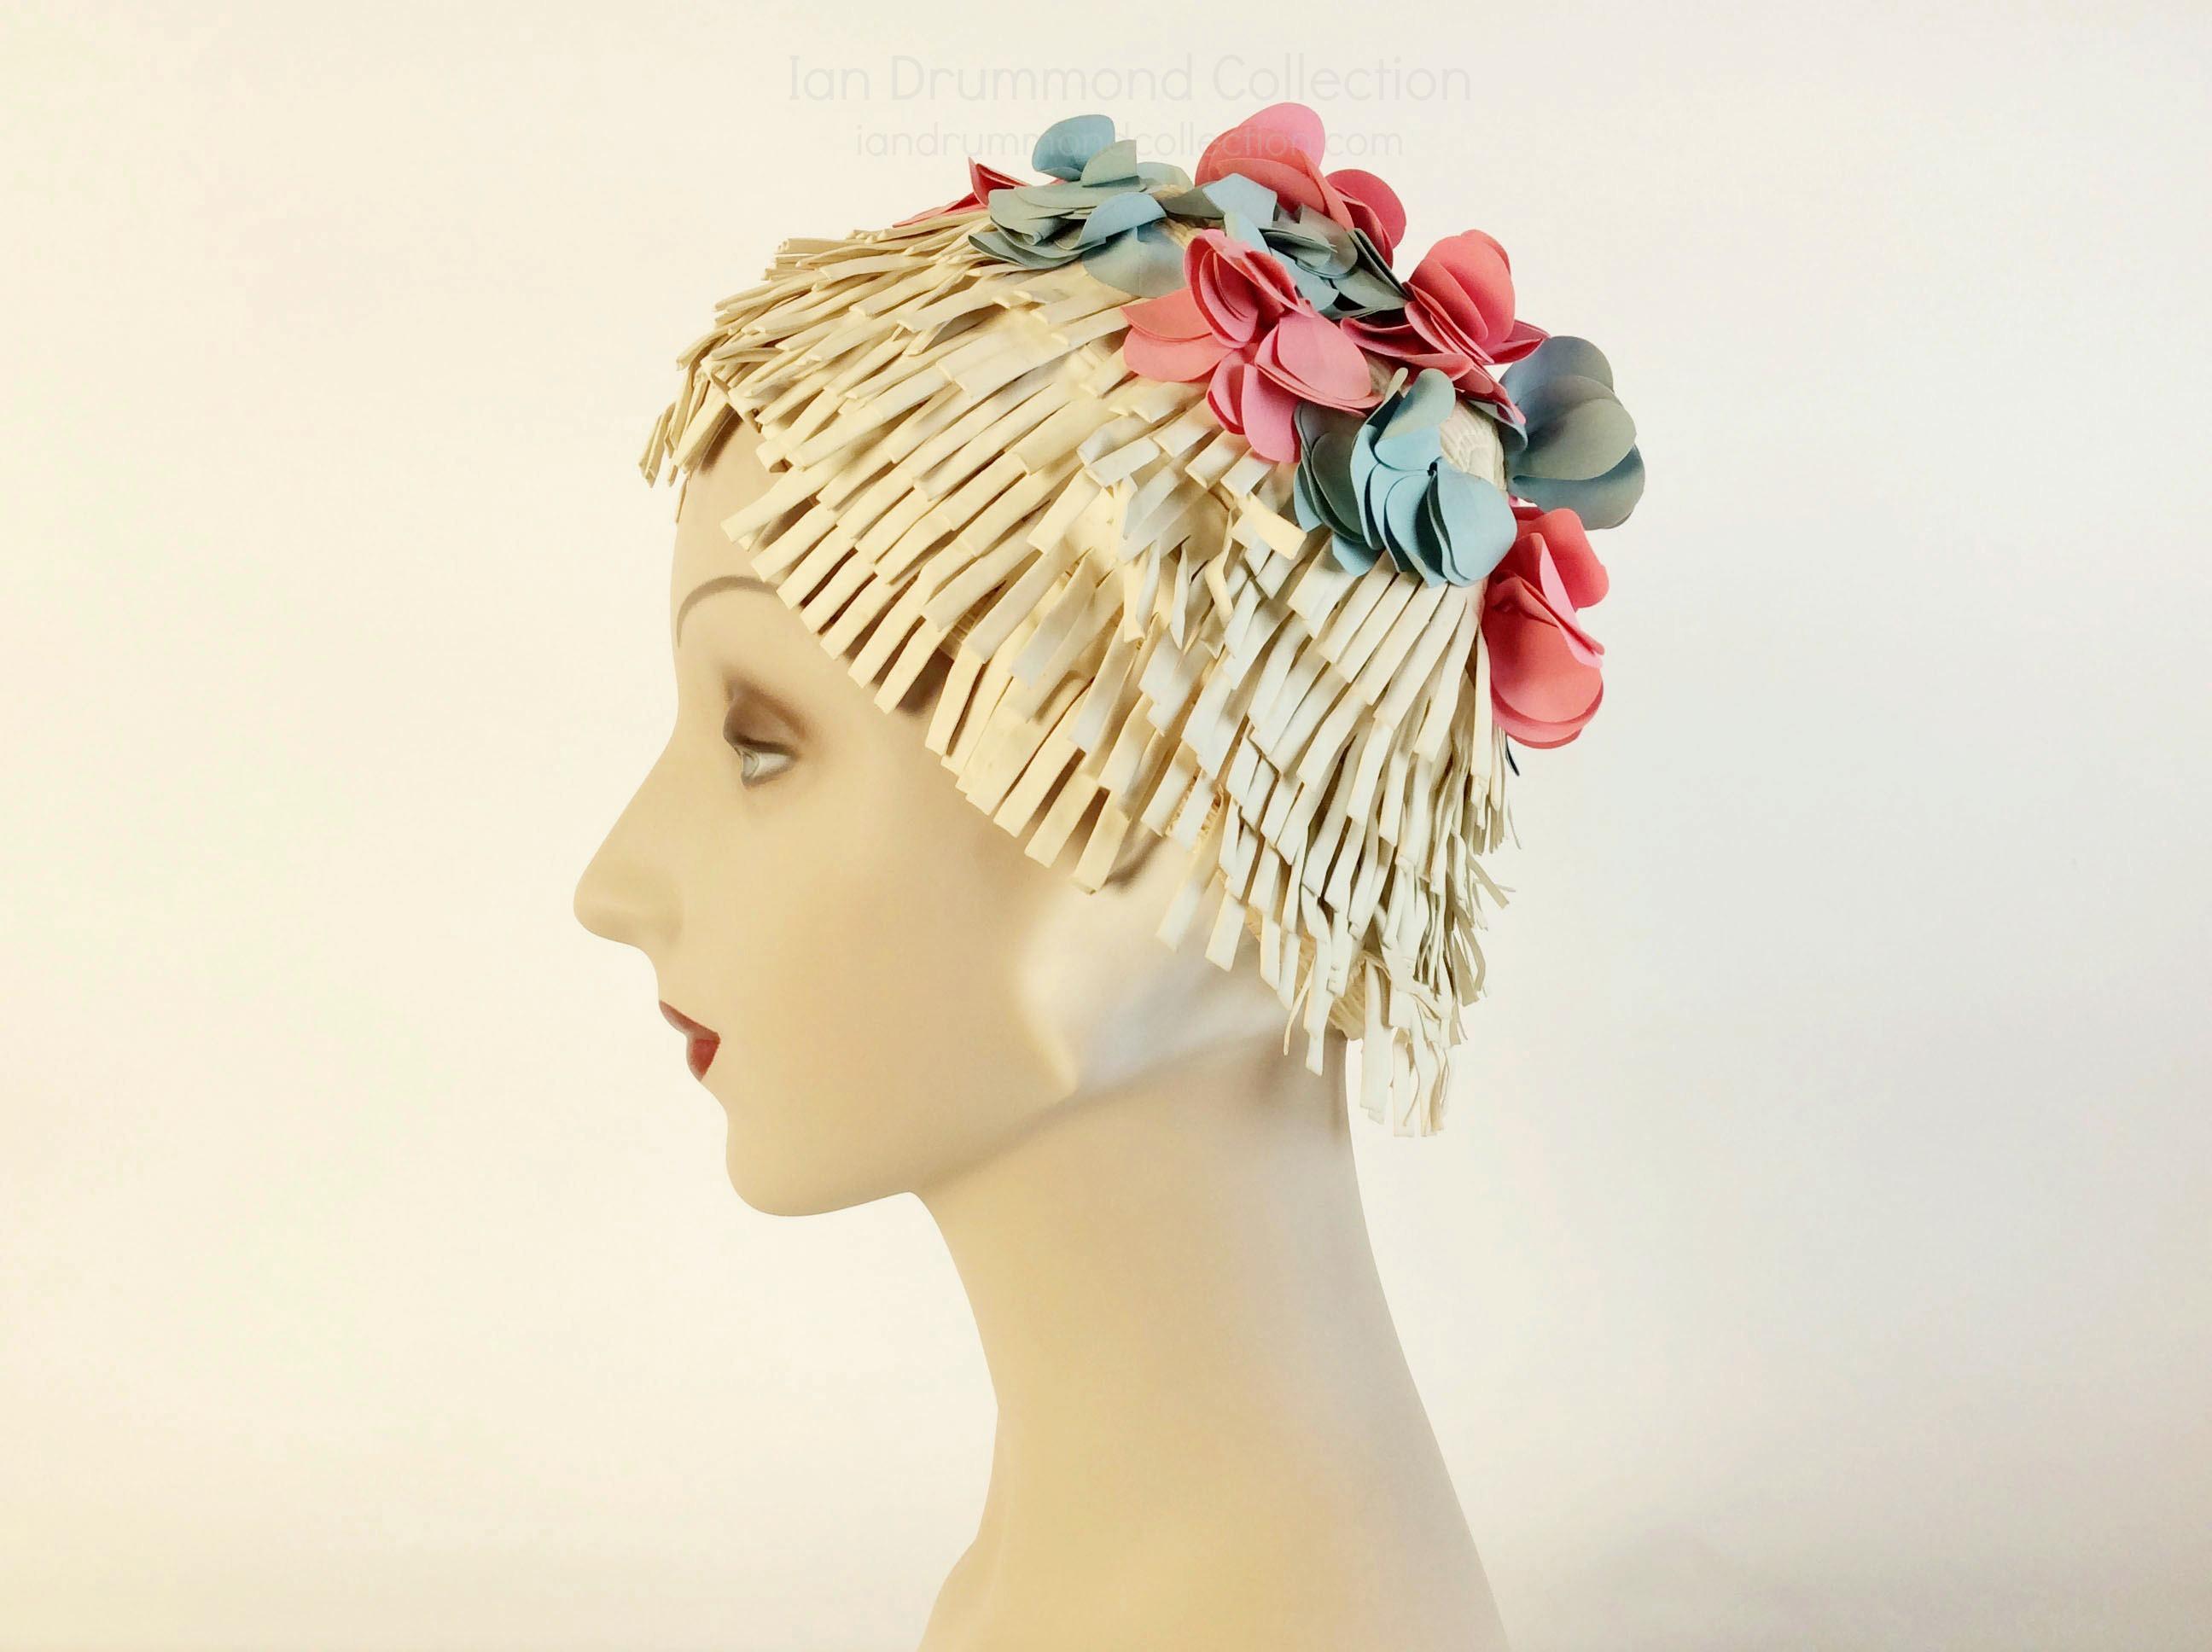 IDC Movie Wardrobe Rental Swim Cap 1 Cream with Pink and Blue Flowers